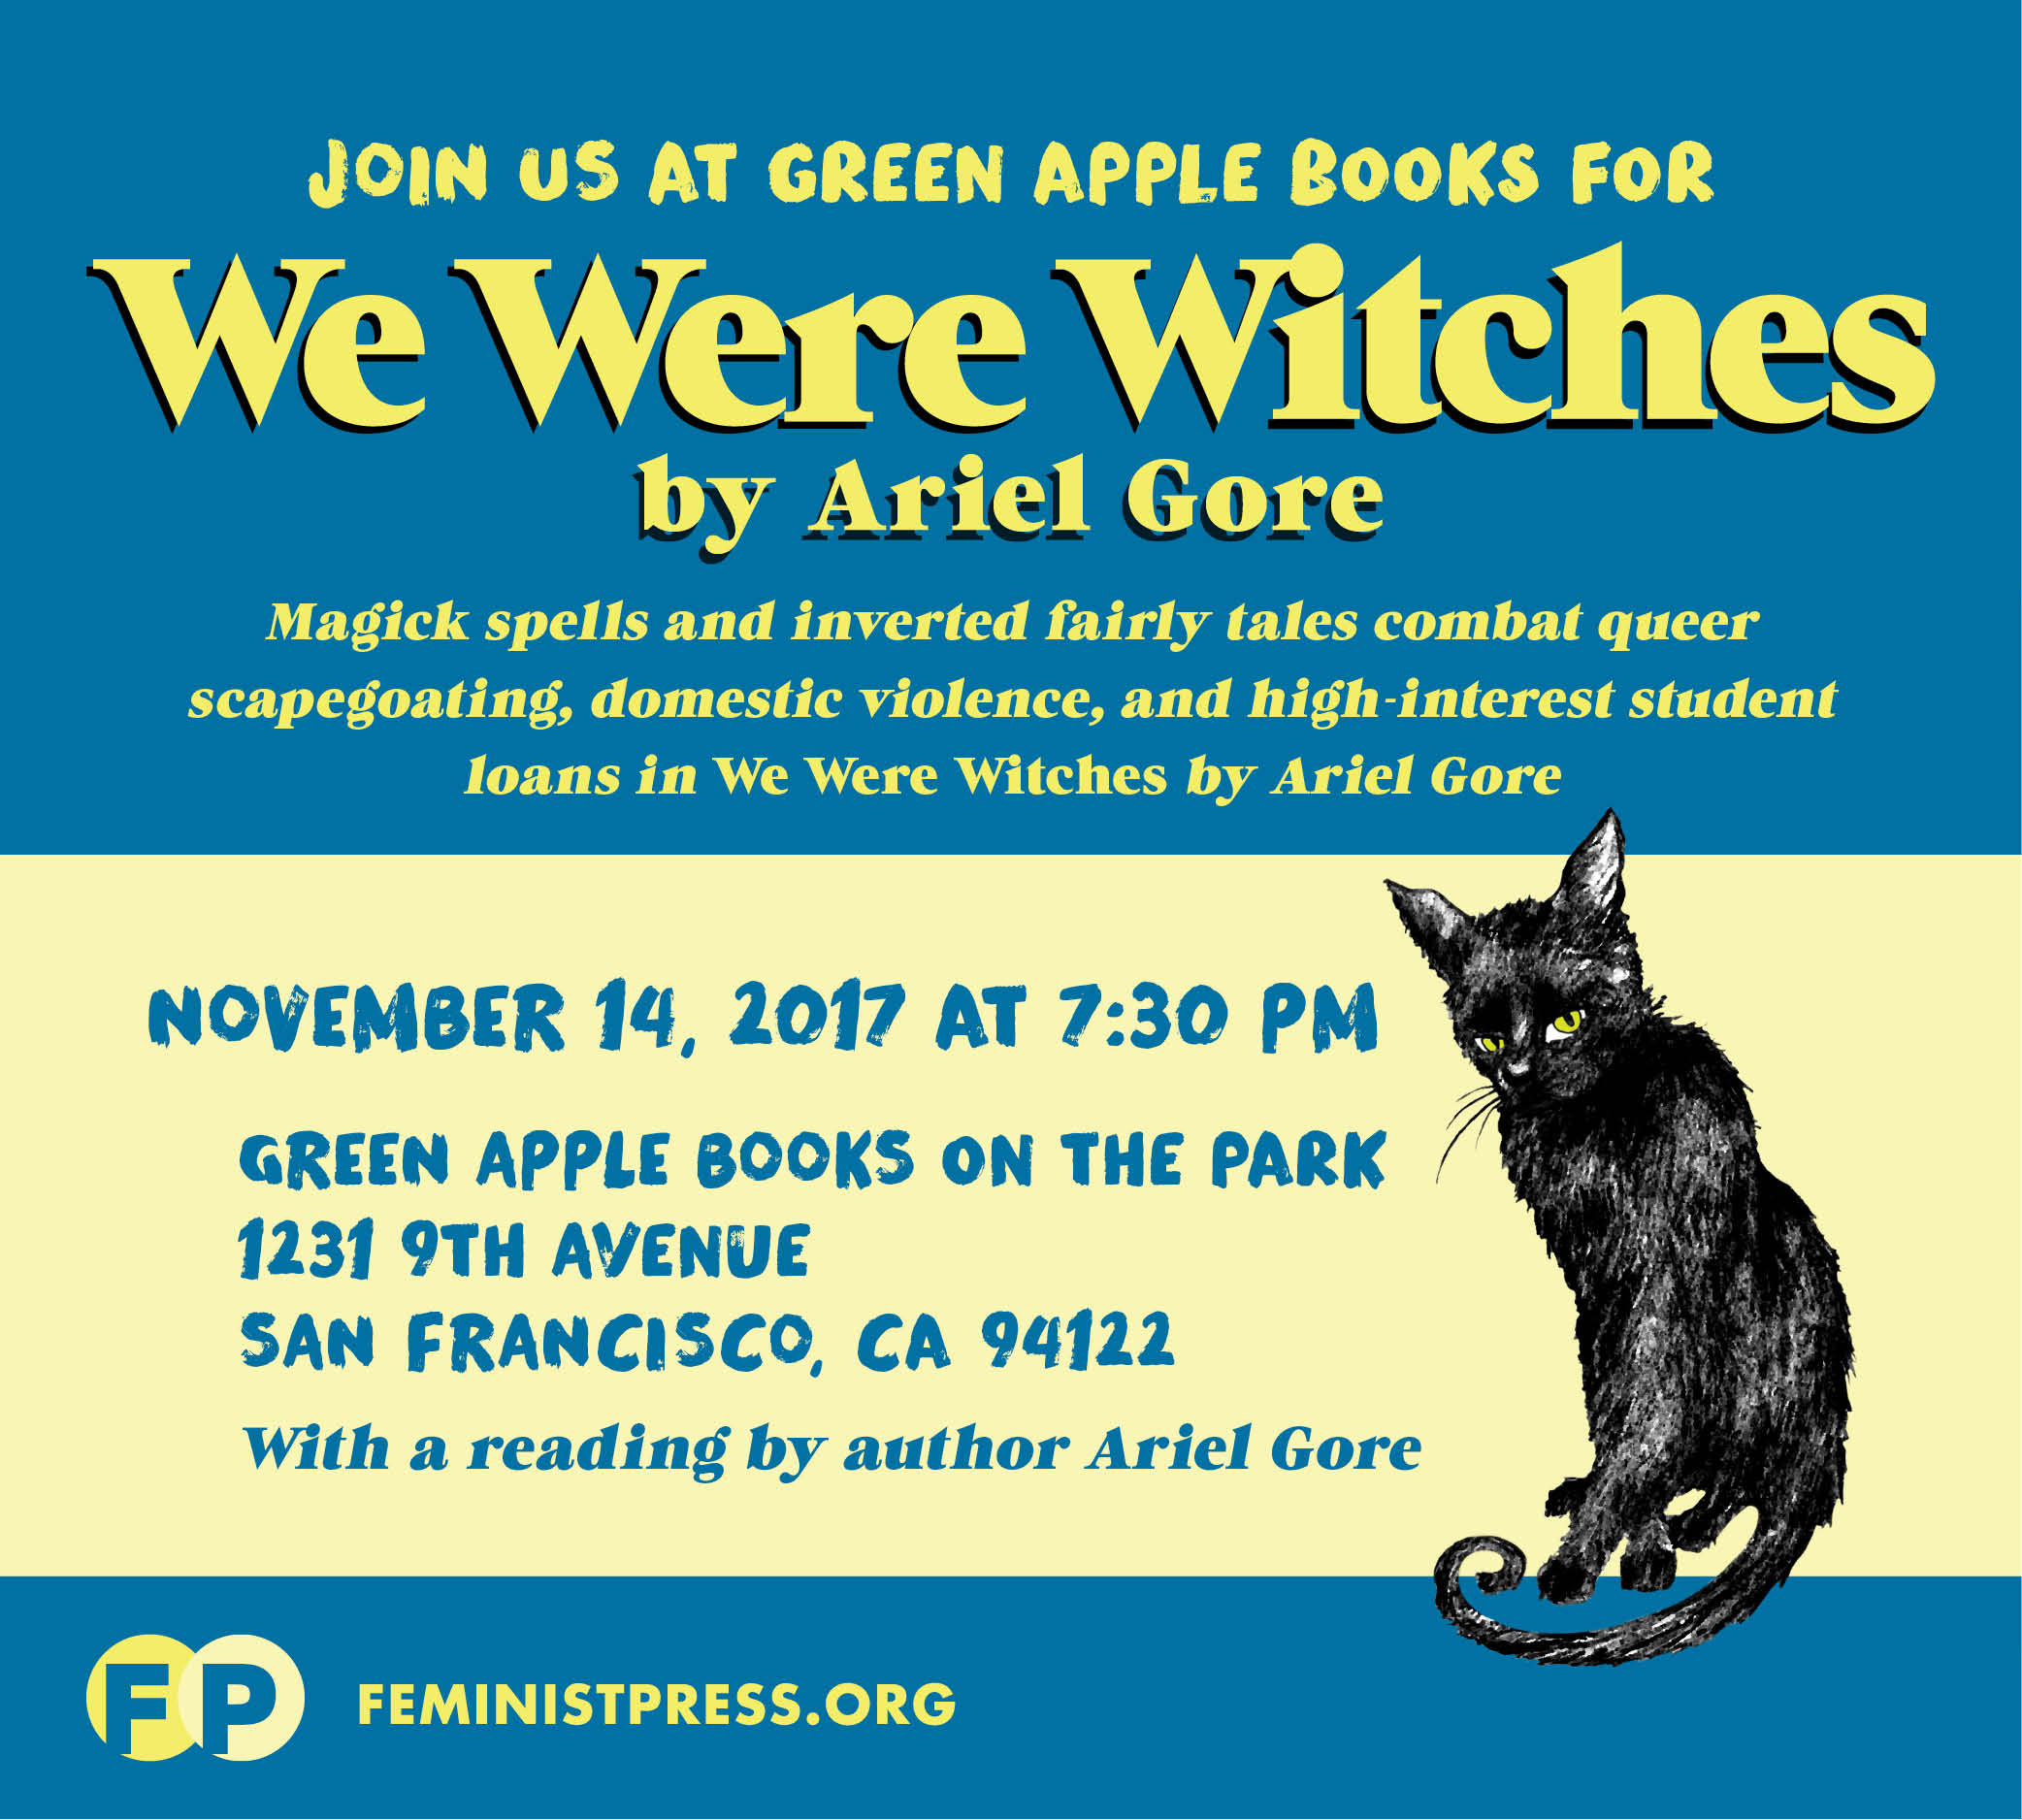 WE_WERE_WITCHES_Event_eblast_GREEN_APPLE_BOOKS-3.jpg